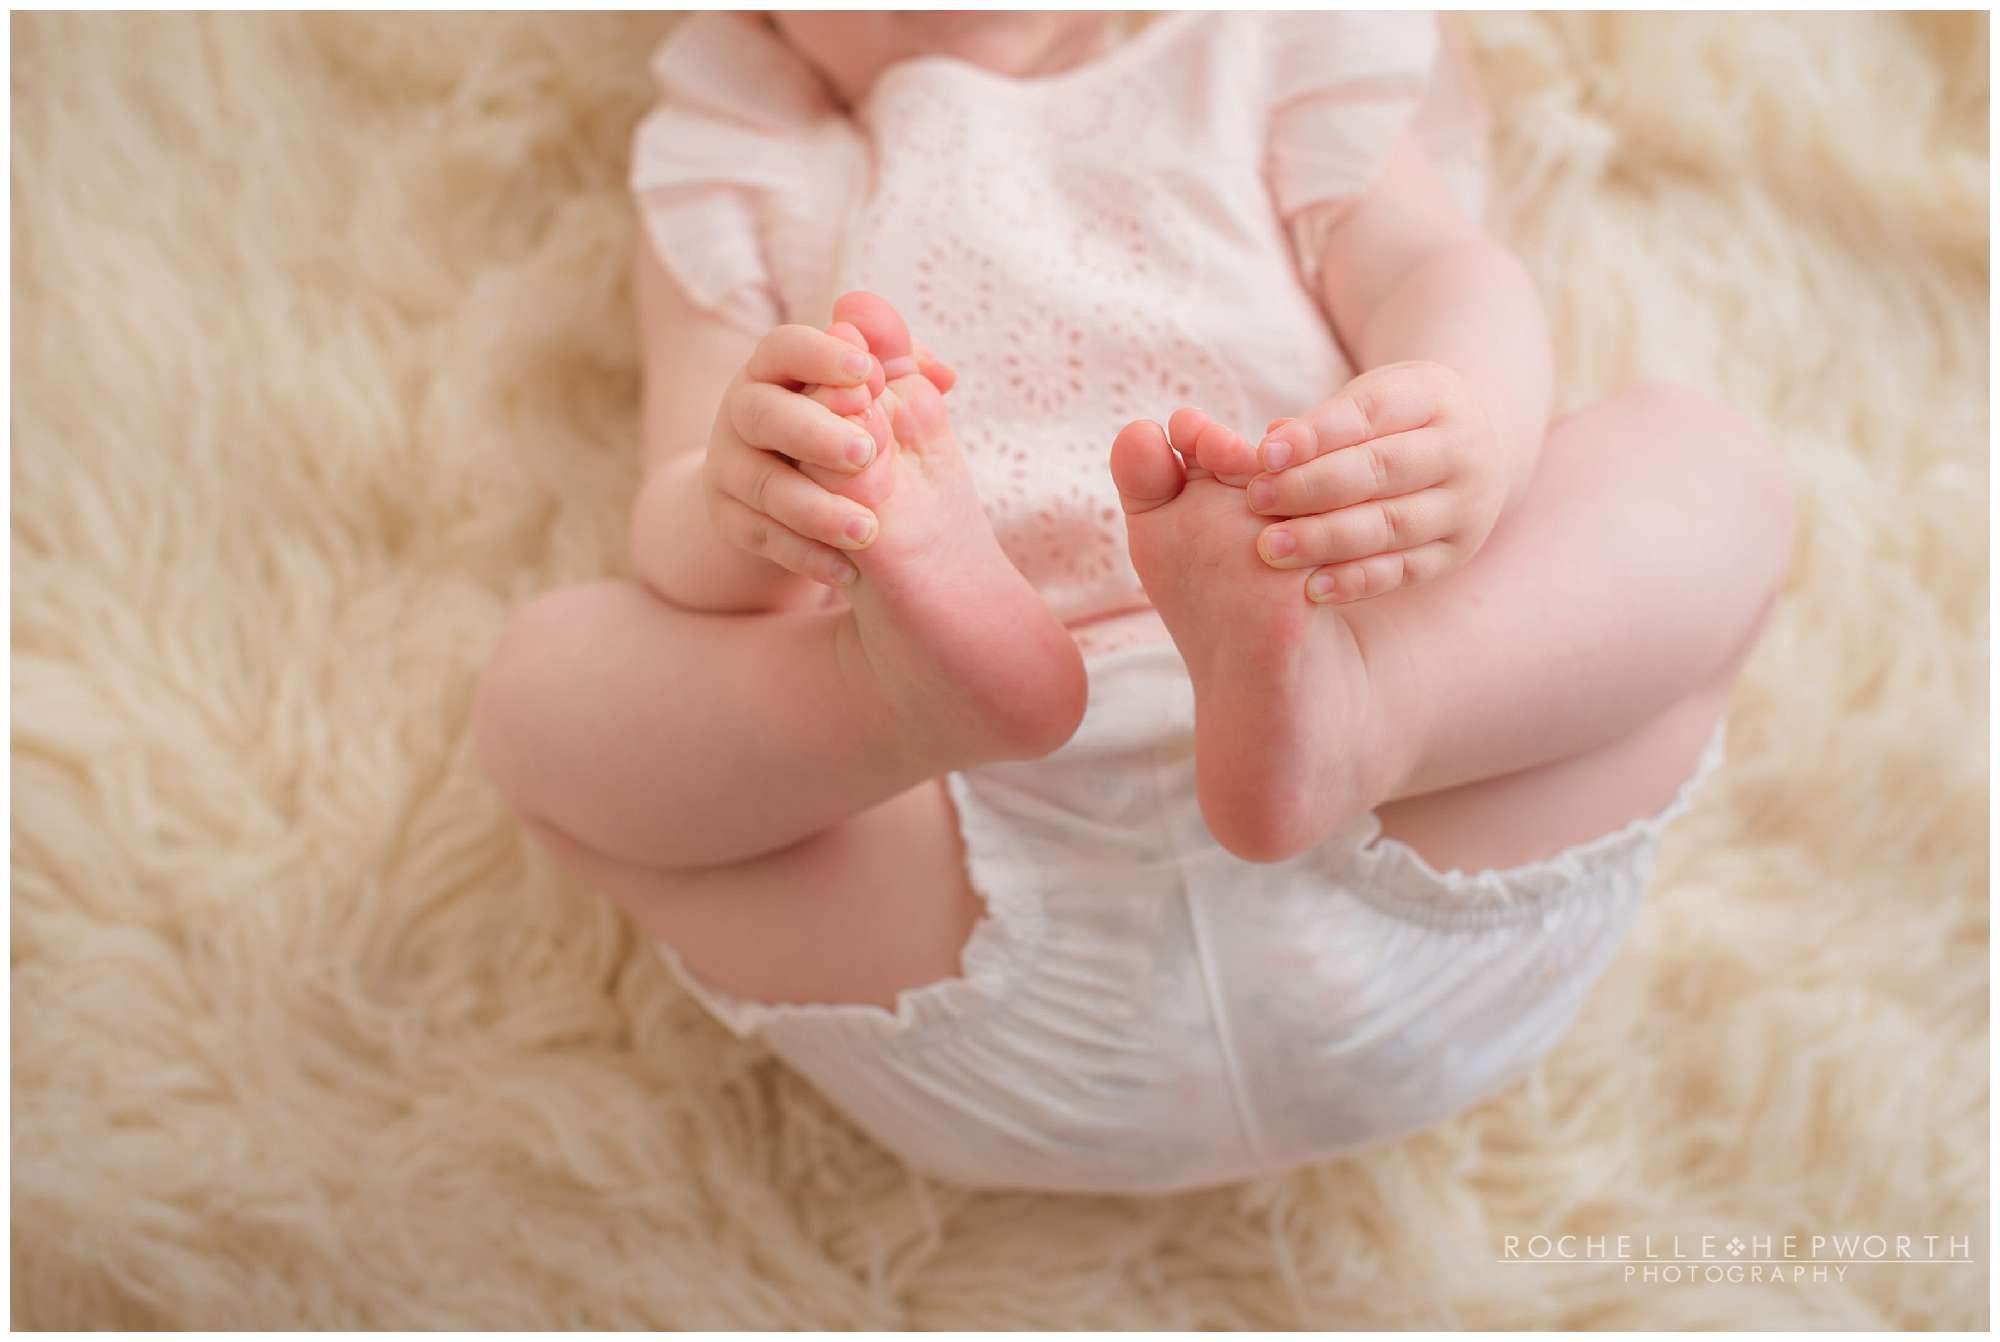 baby girl holding her feet on cream shaggy carpet